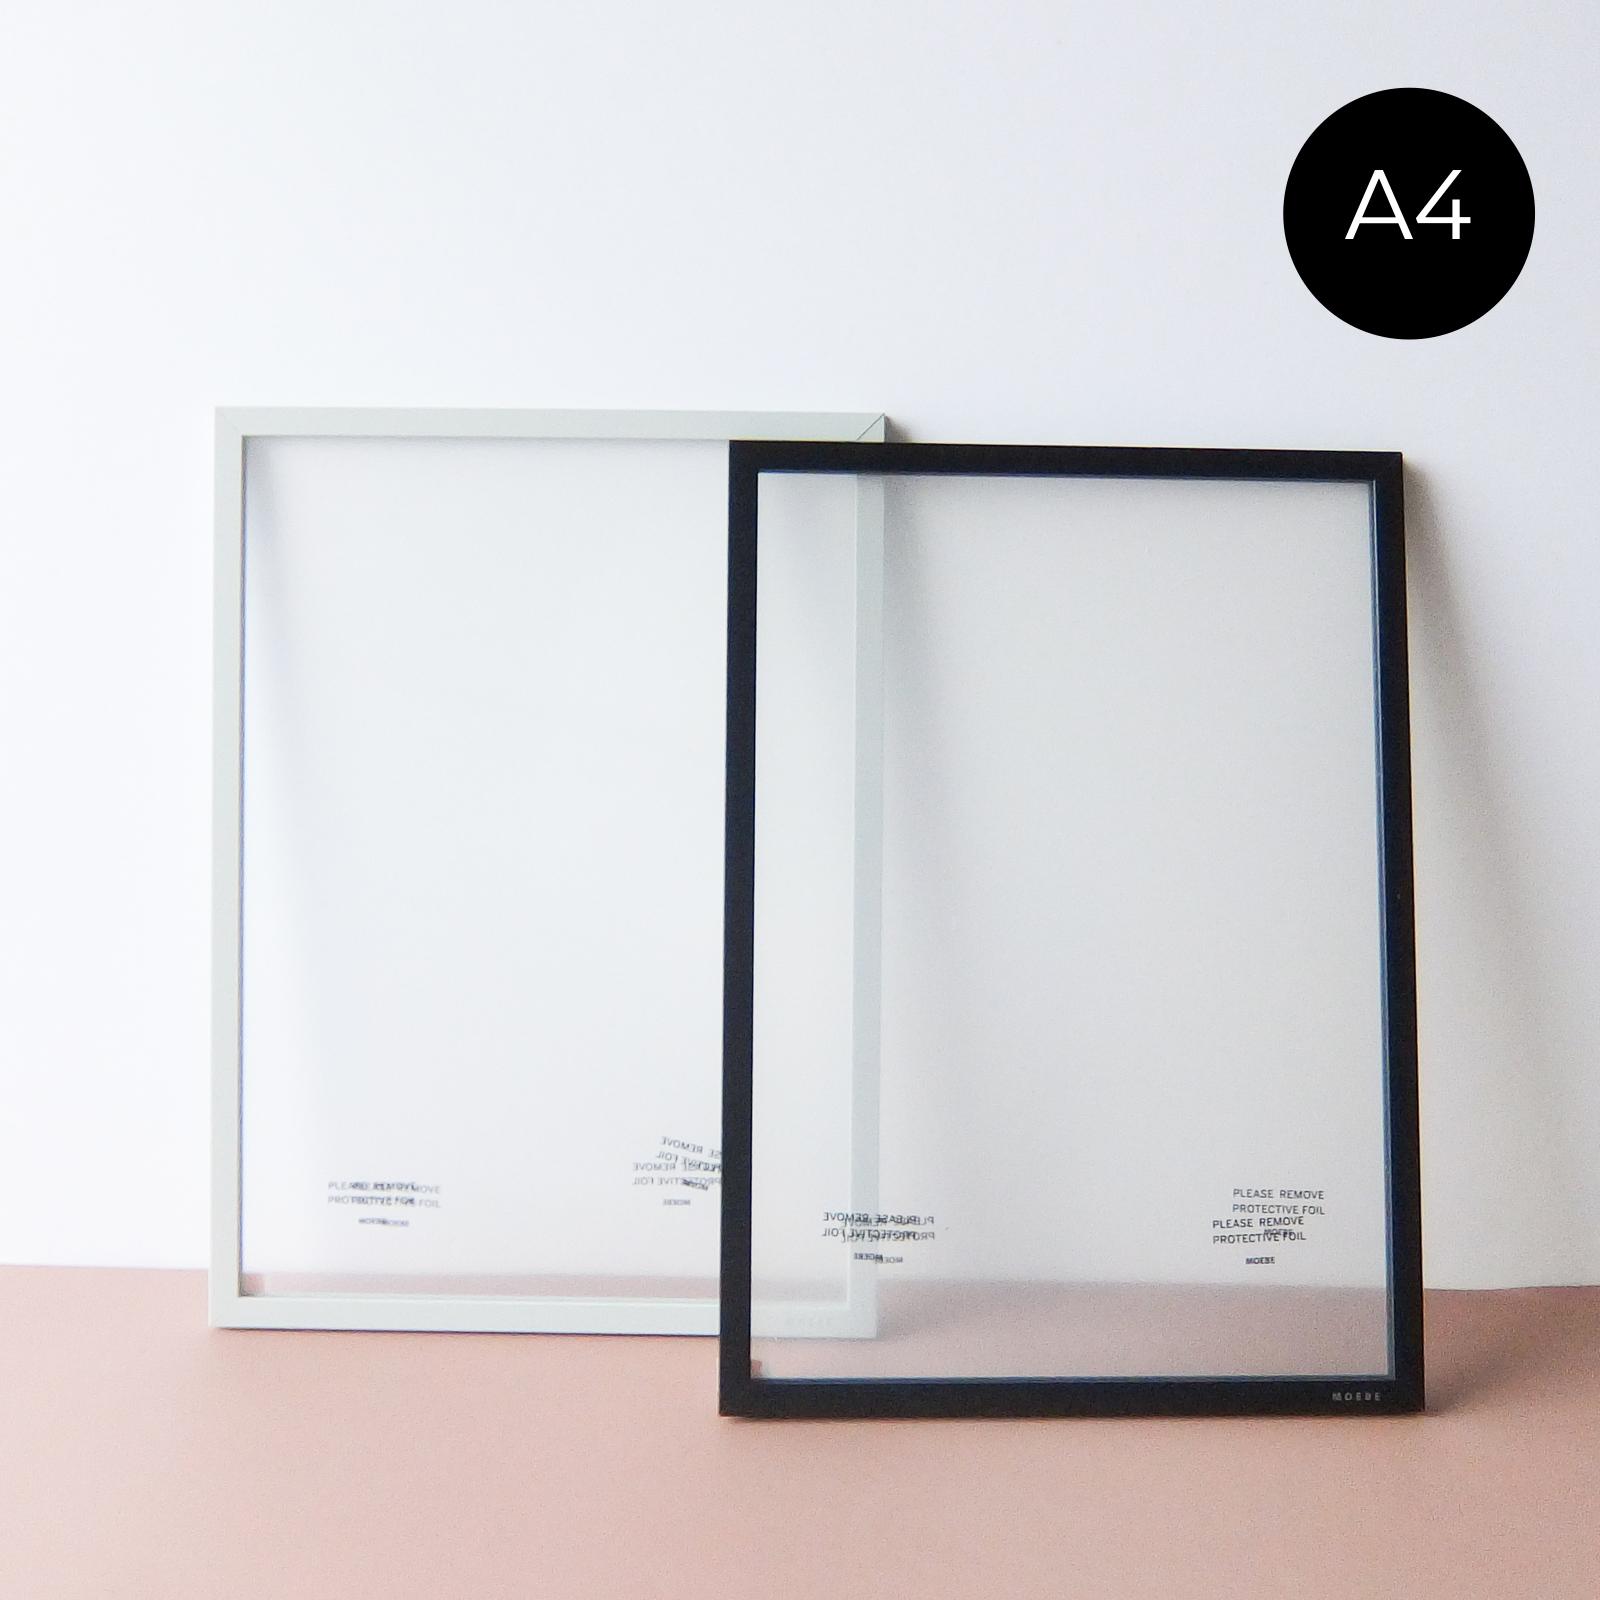 MOEBE - A4 ムーべ アートフレーム - Light Grey / Black / Oak